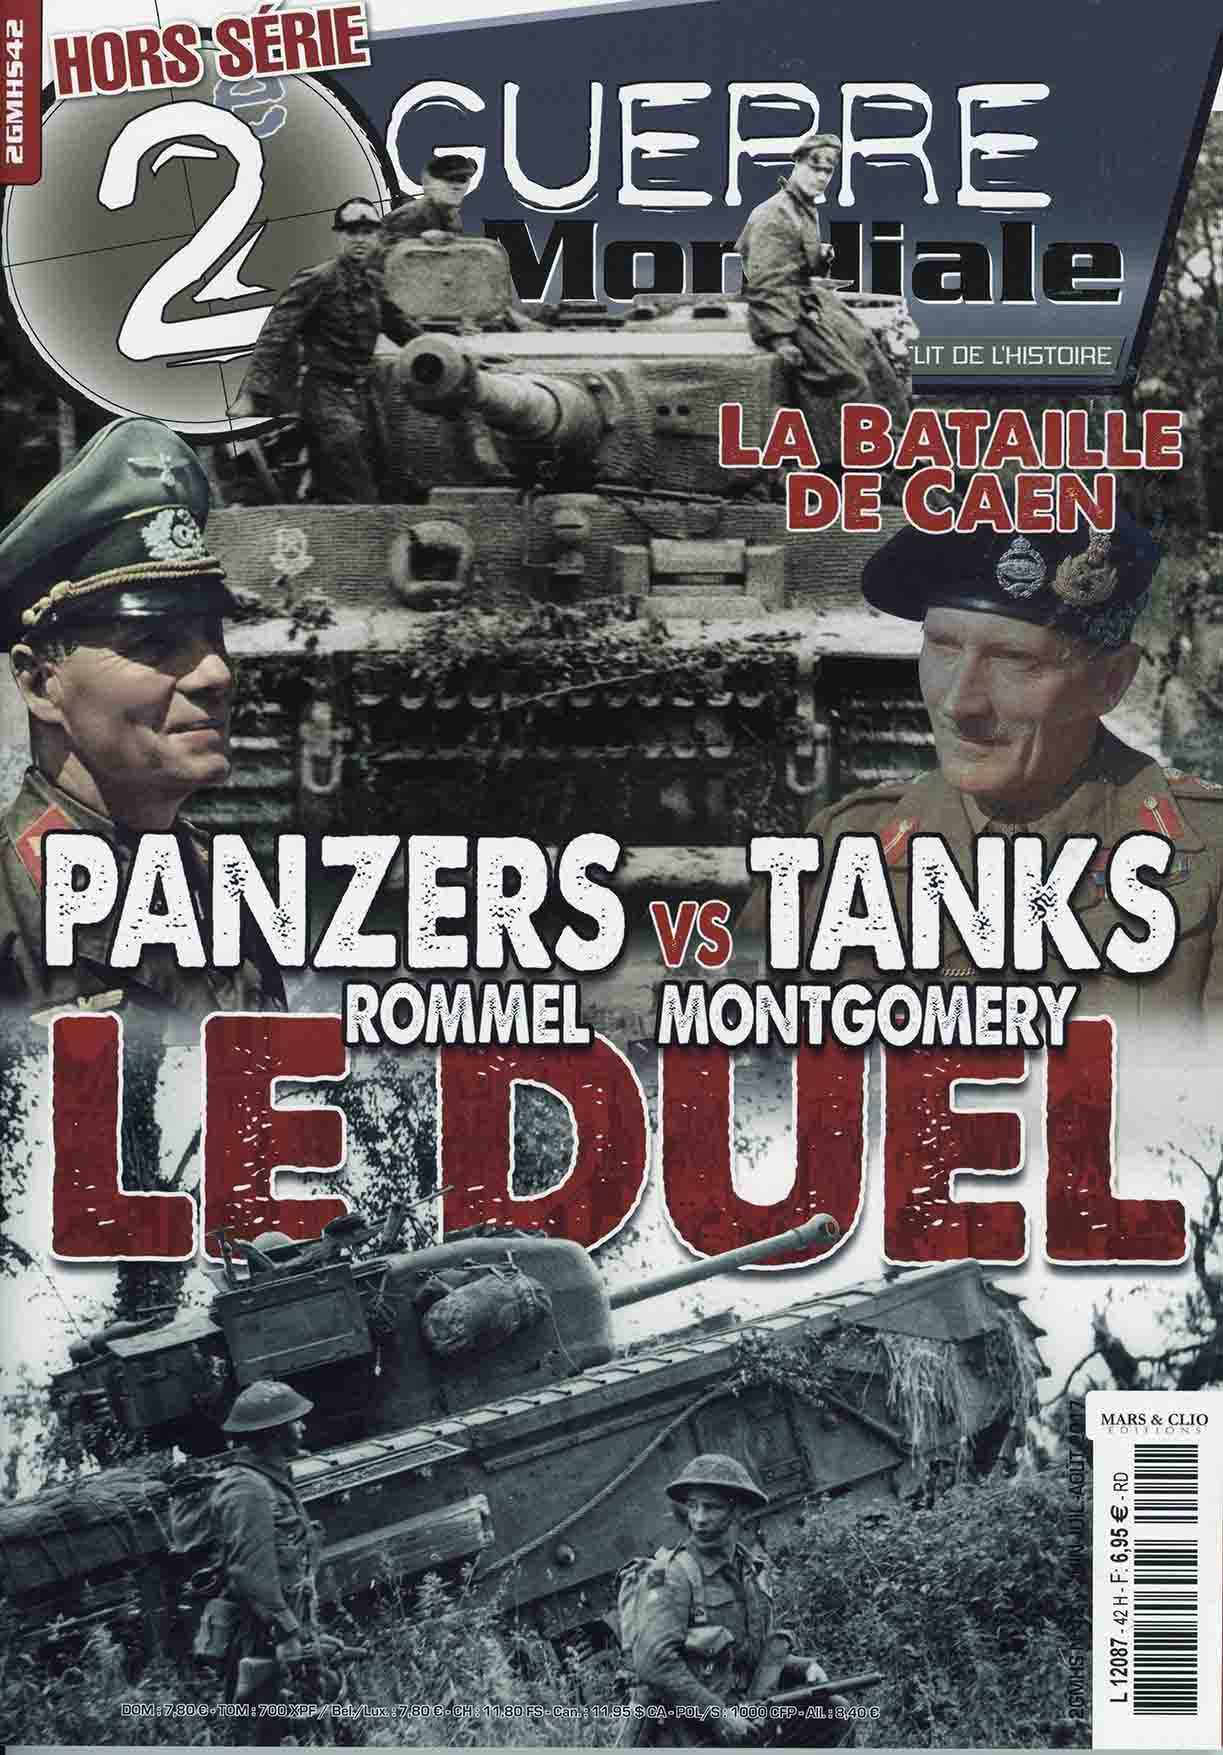 Rommel Montgomery le duel